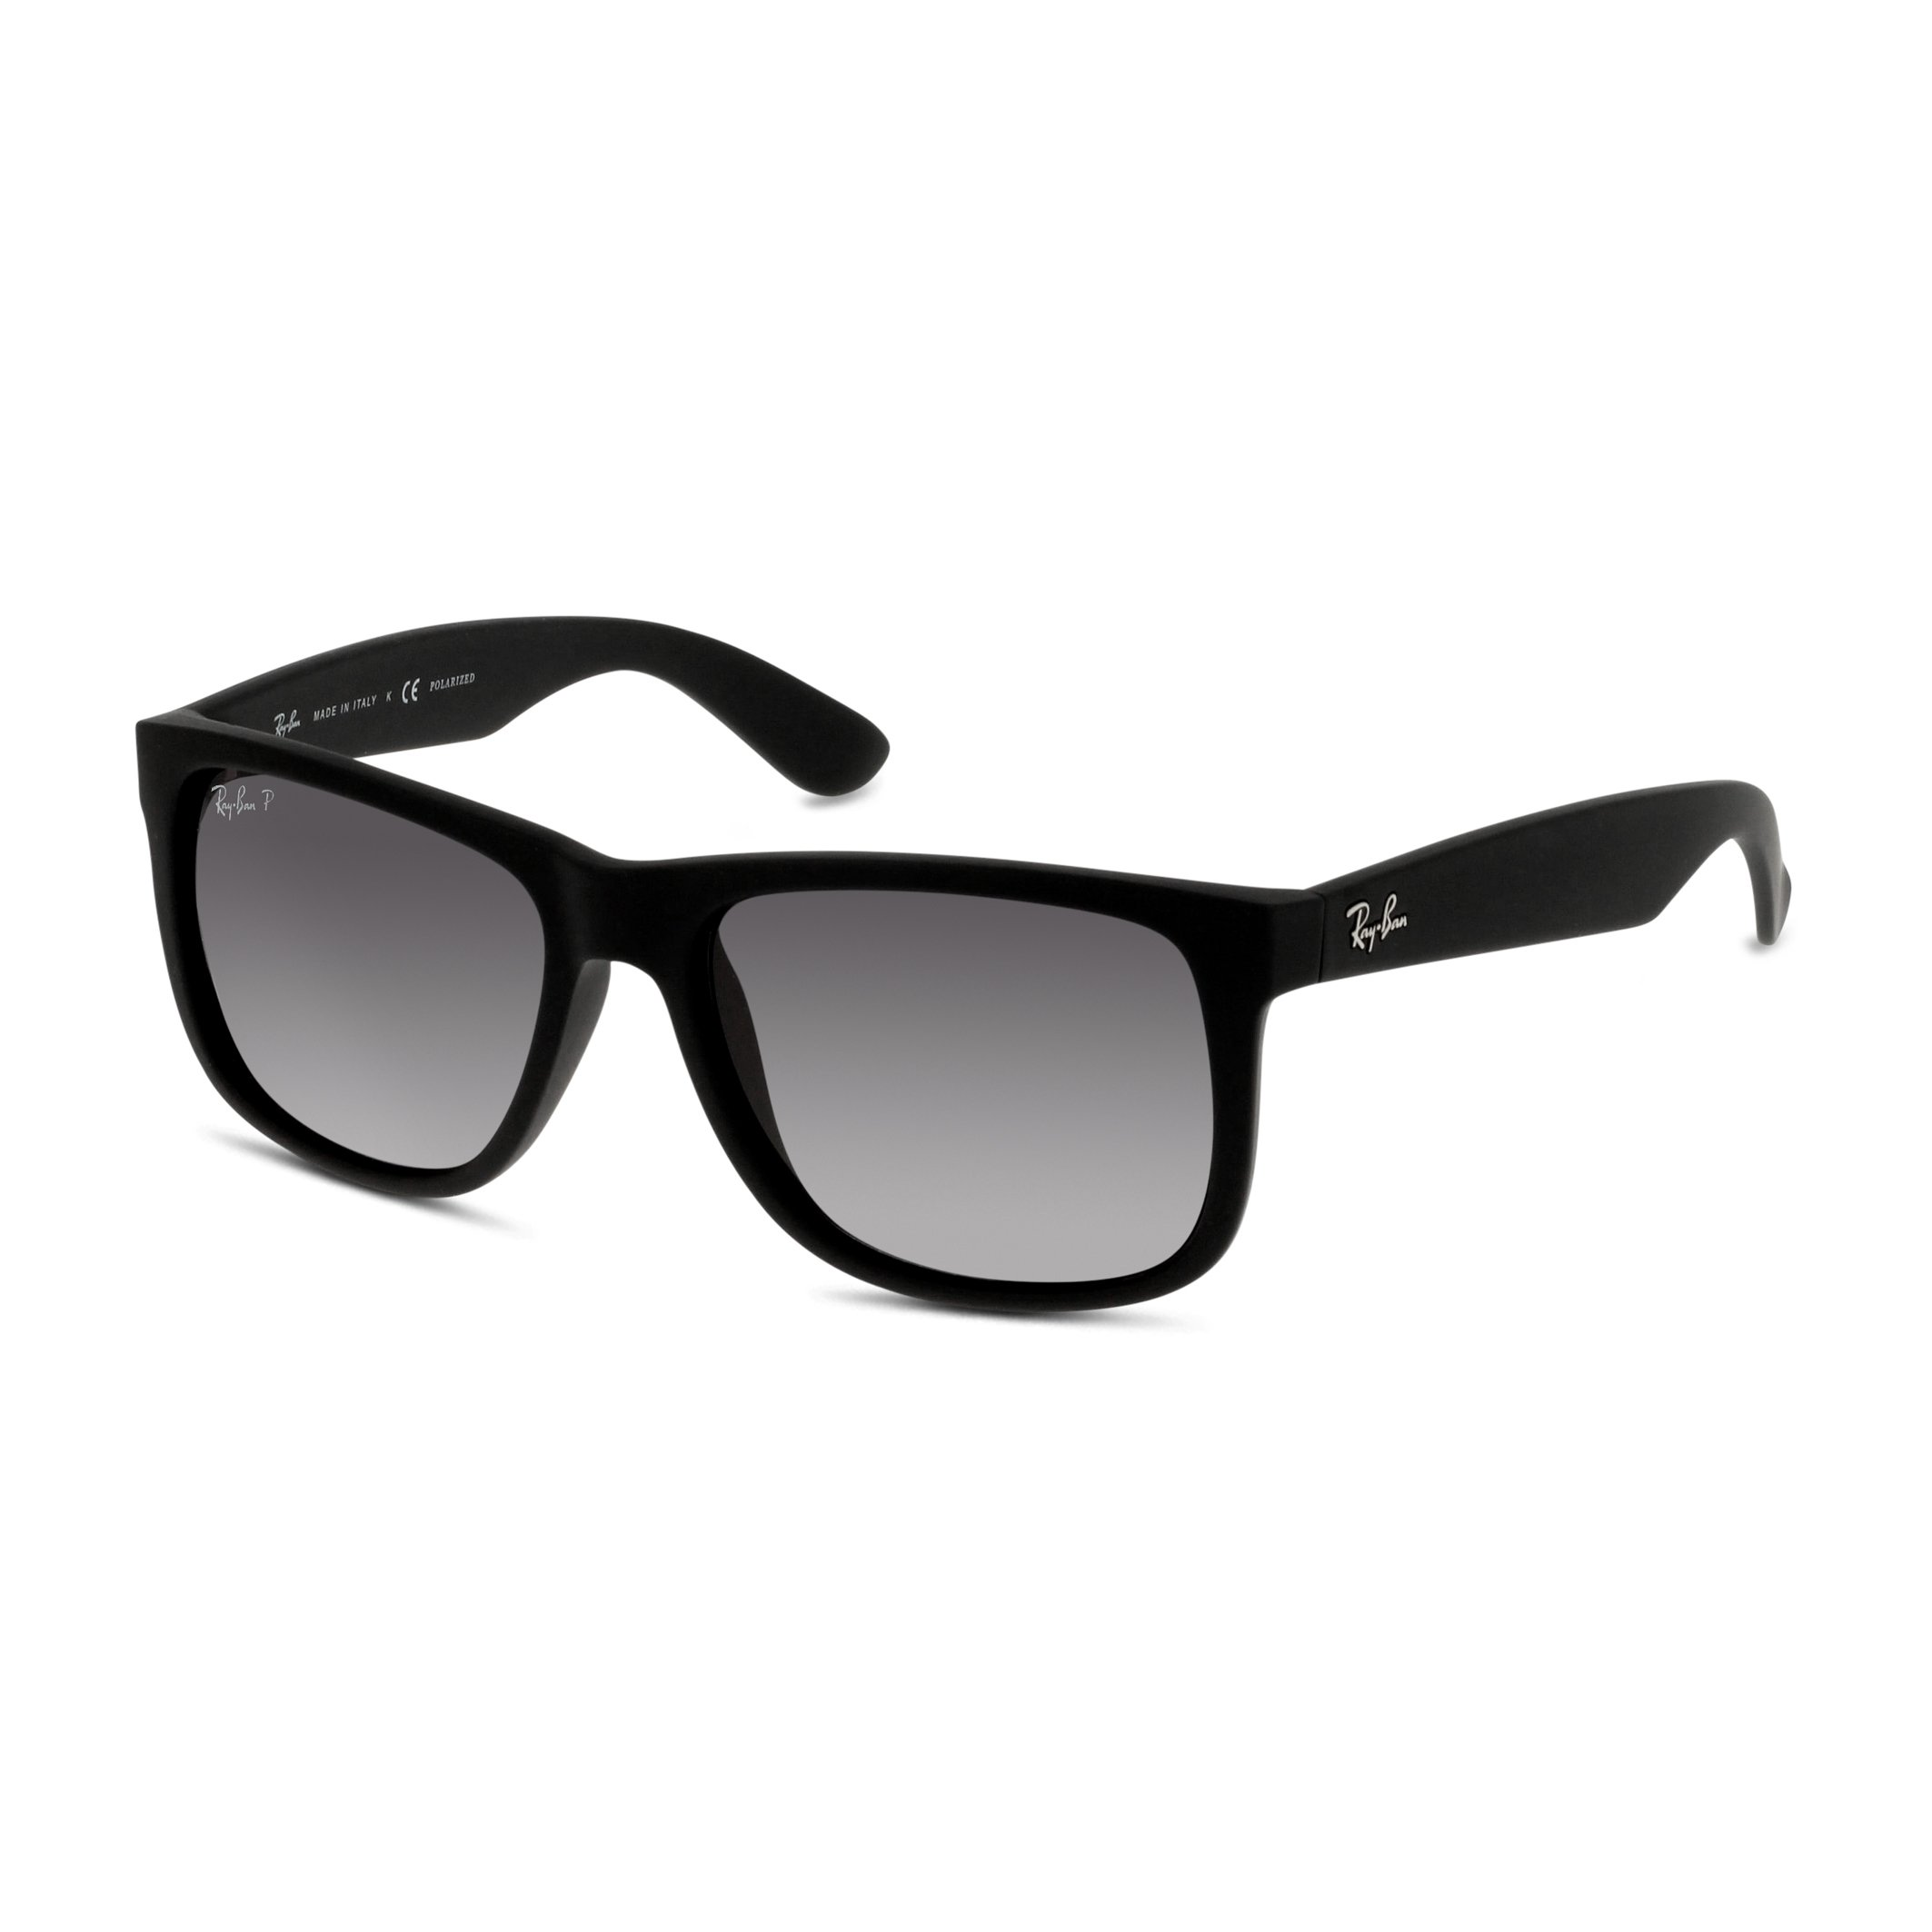 Ray-Ban Unisex Sunglasses Black 0RB4165F - black-4 NOSIZE